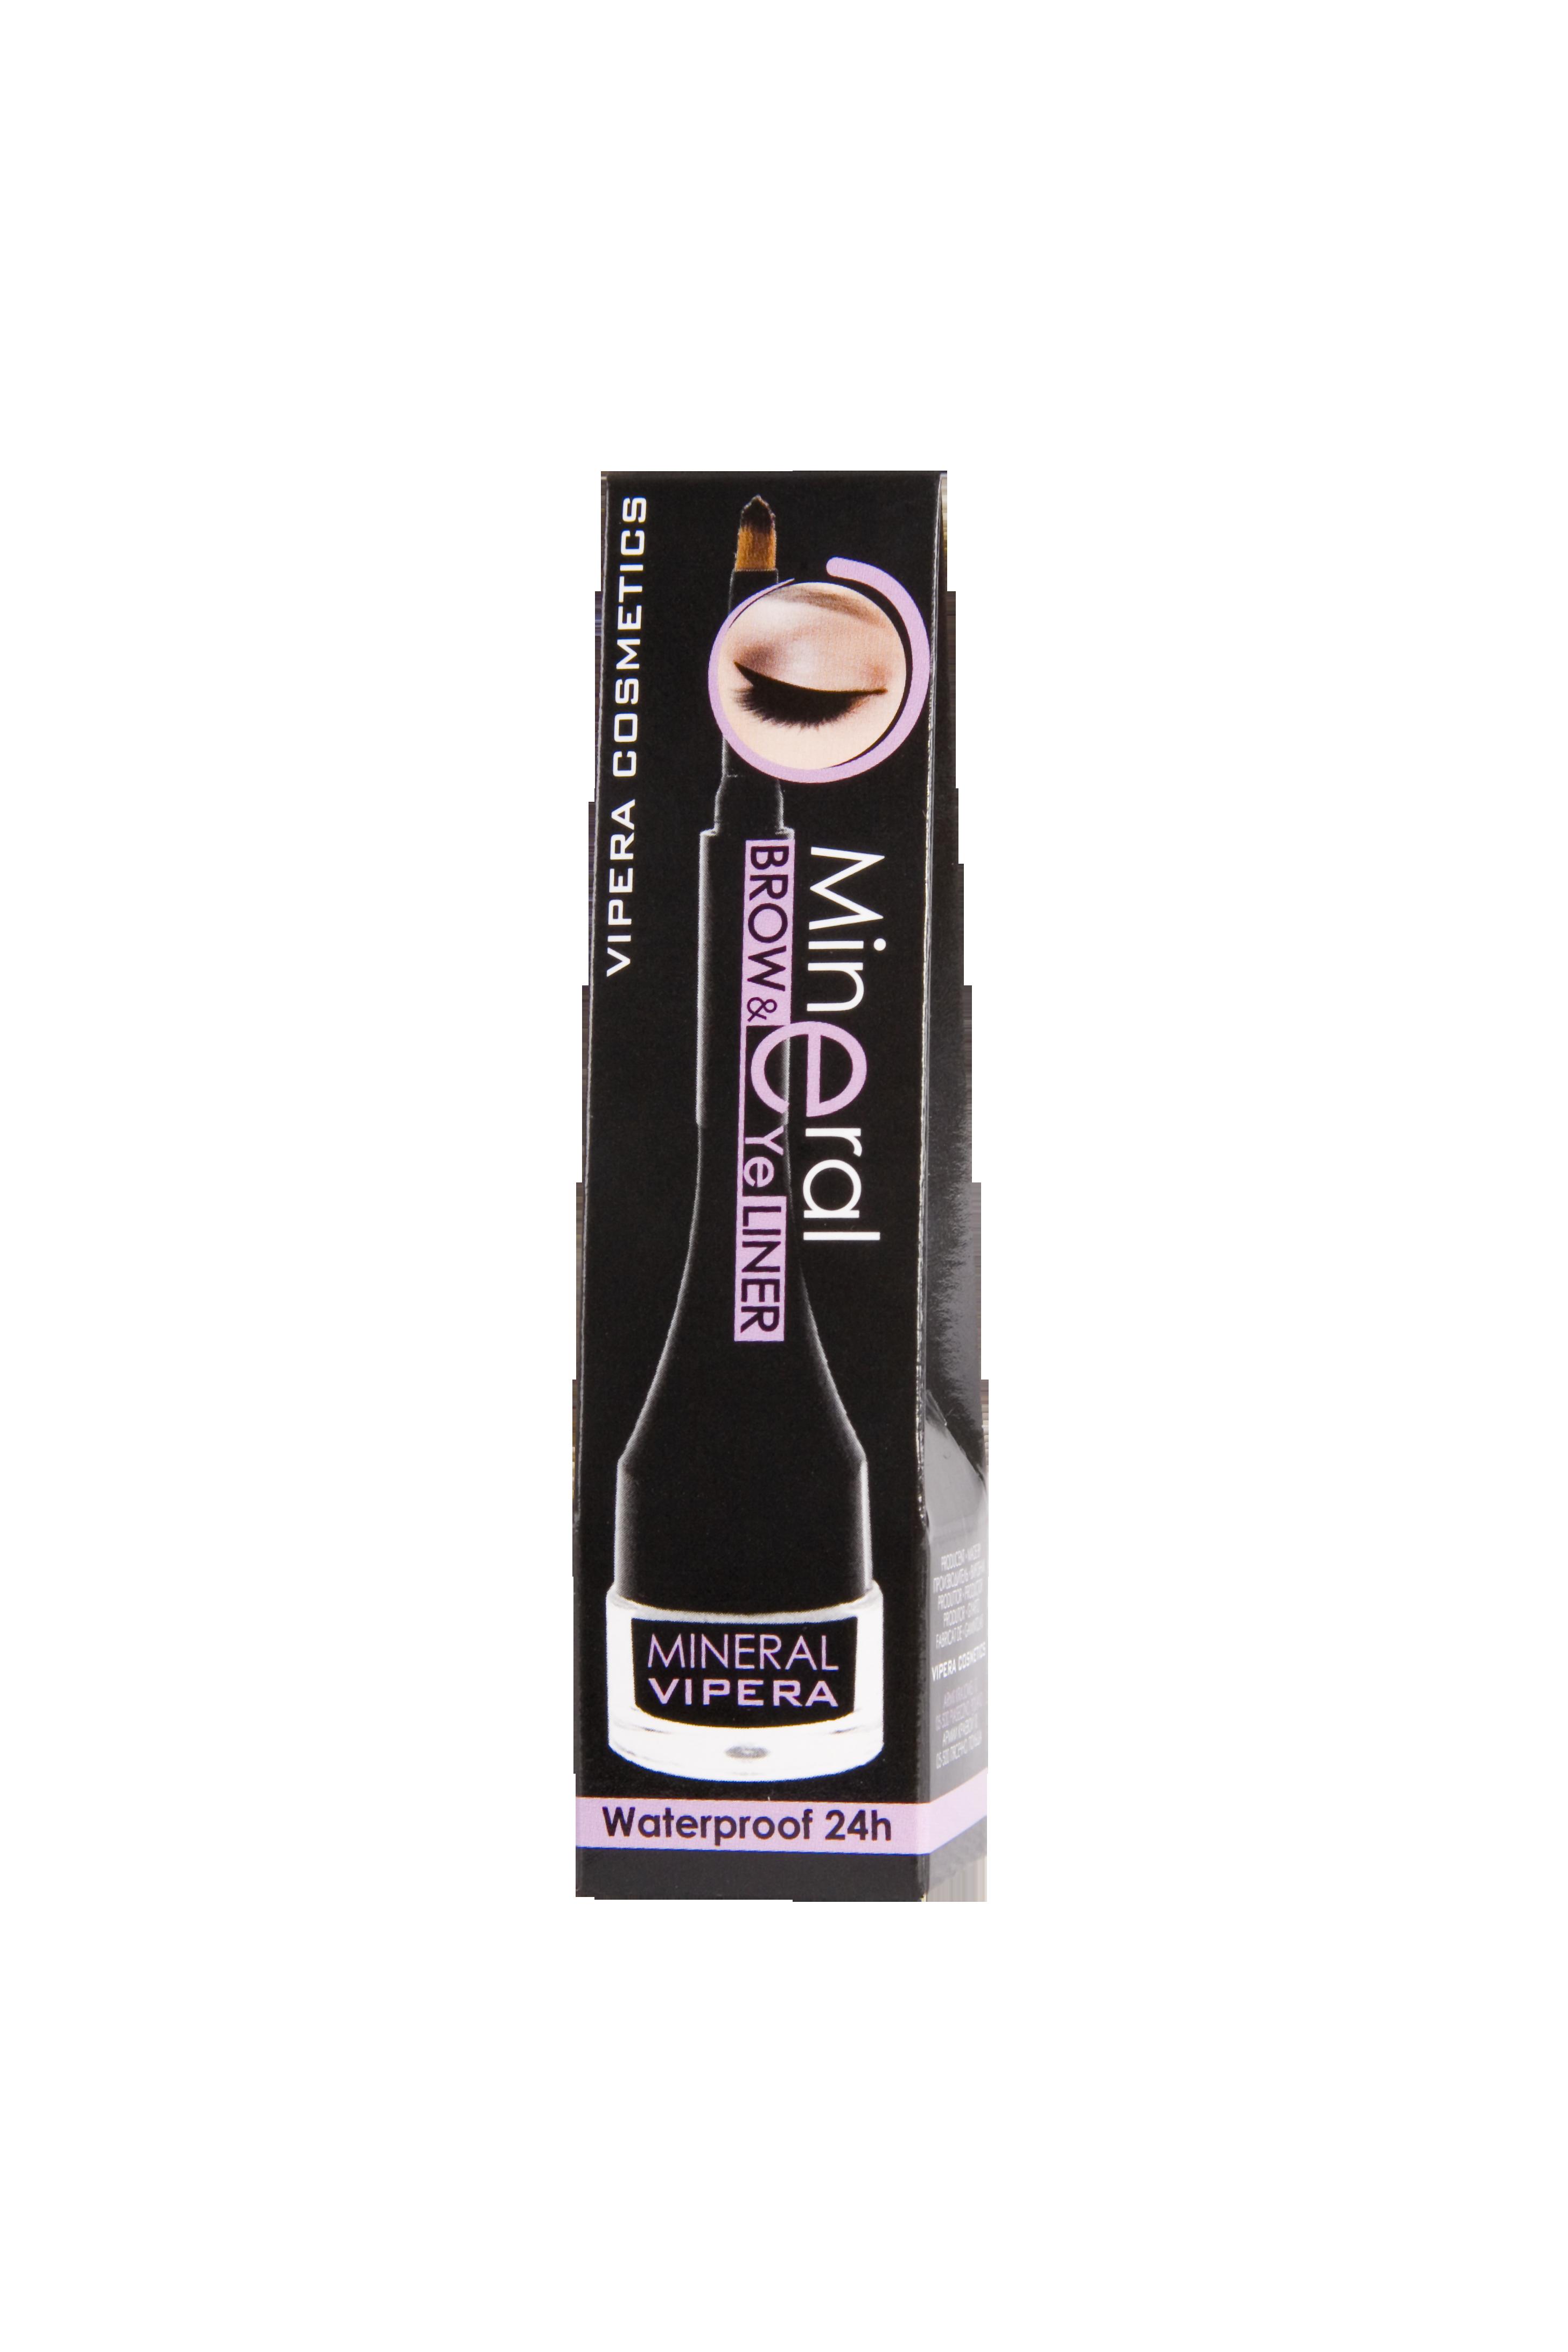 Creion-tus rezistent la apa pentru ochi si sprancene - Mineral [1]